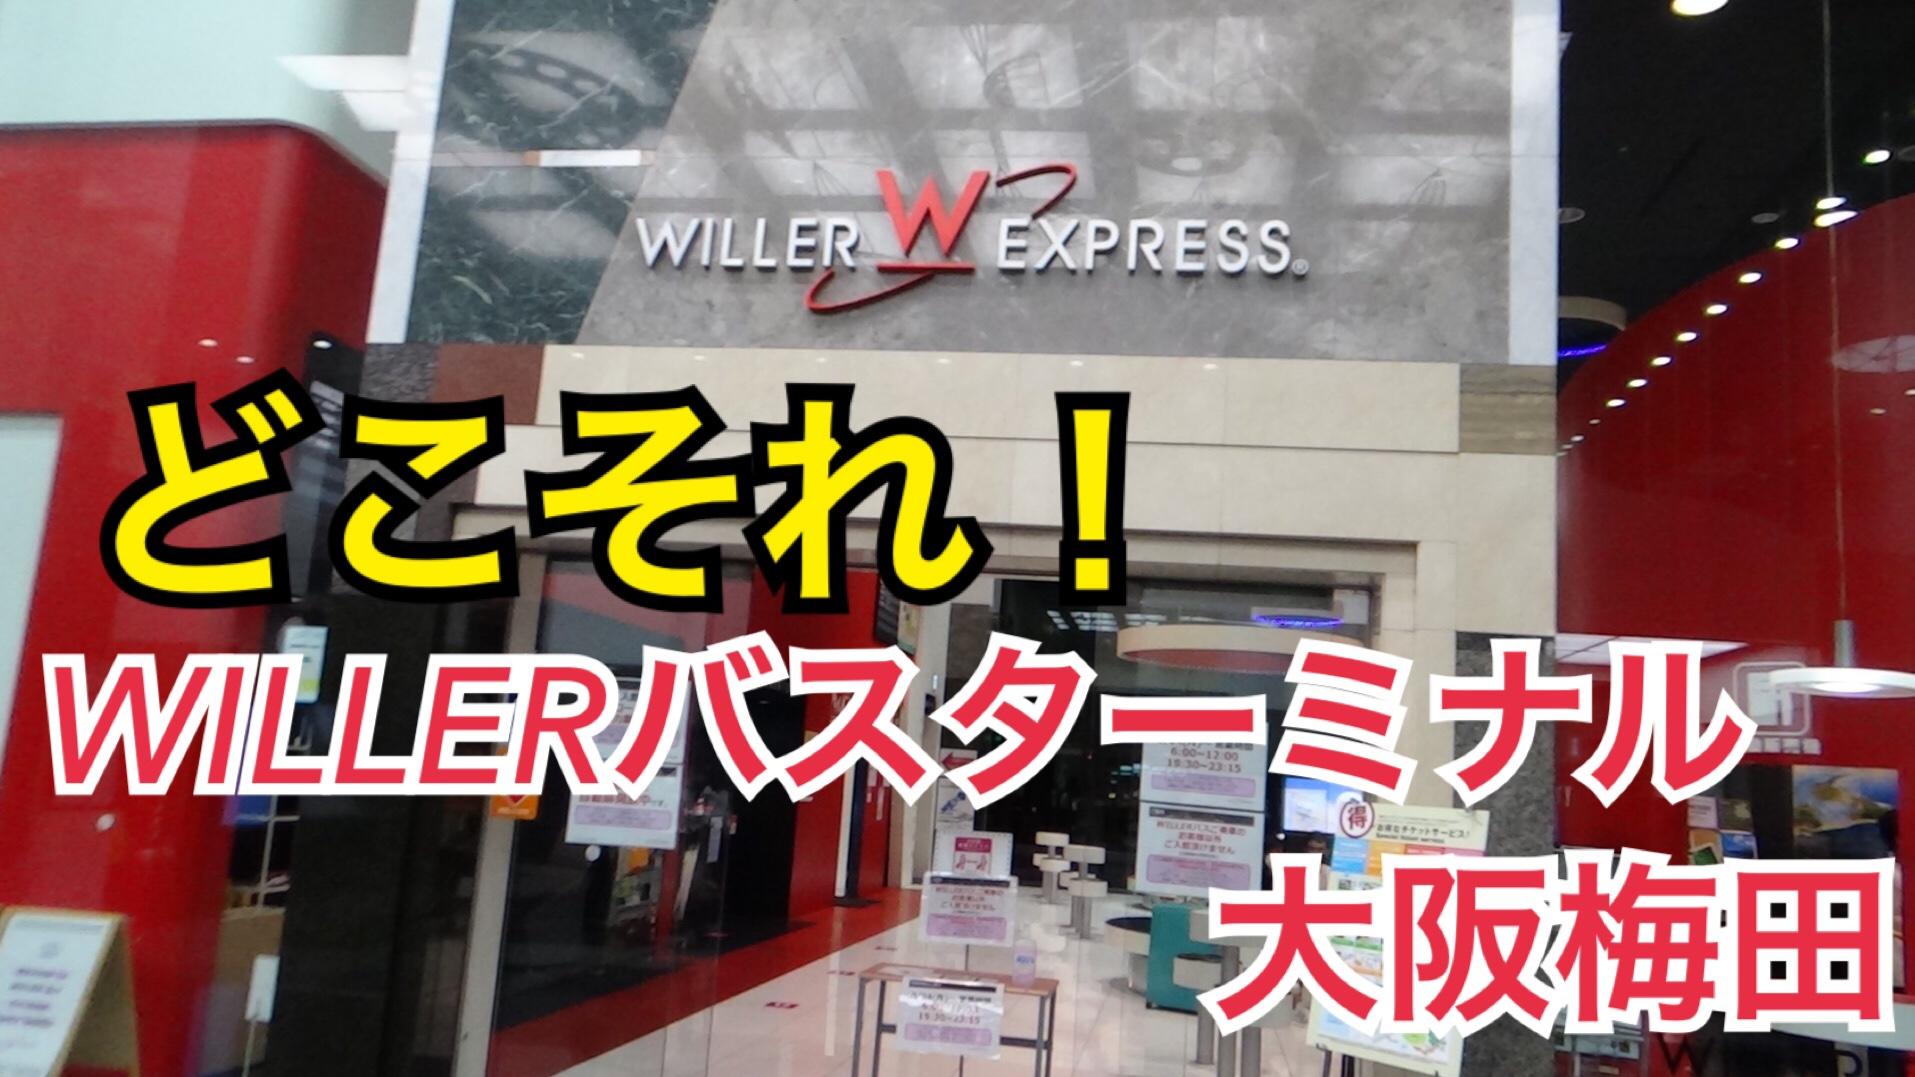 WILLERバスターミナル大阪梅田ってどこ!大阪のウィラーのバス停までの行き方をご案内!【西日本1周の旅】